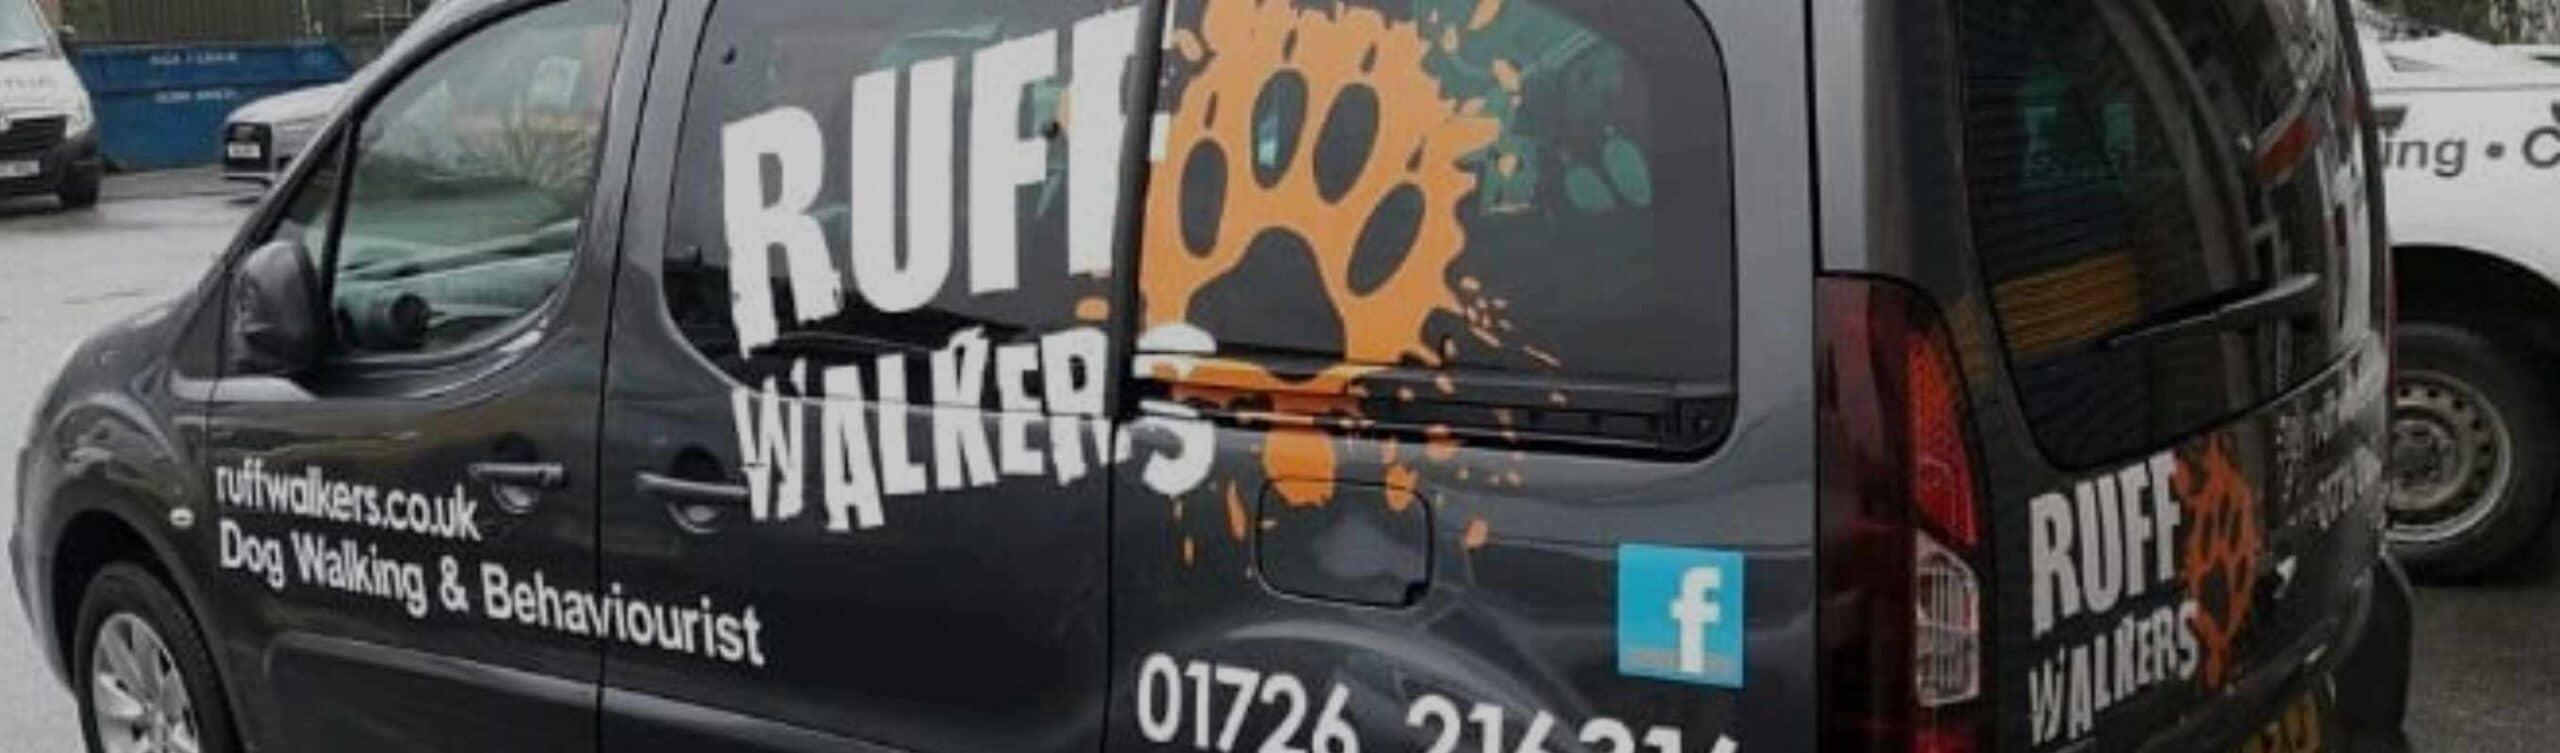 Ruff Walkers Vehicle Sign Writing